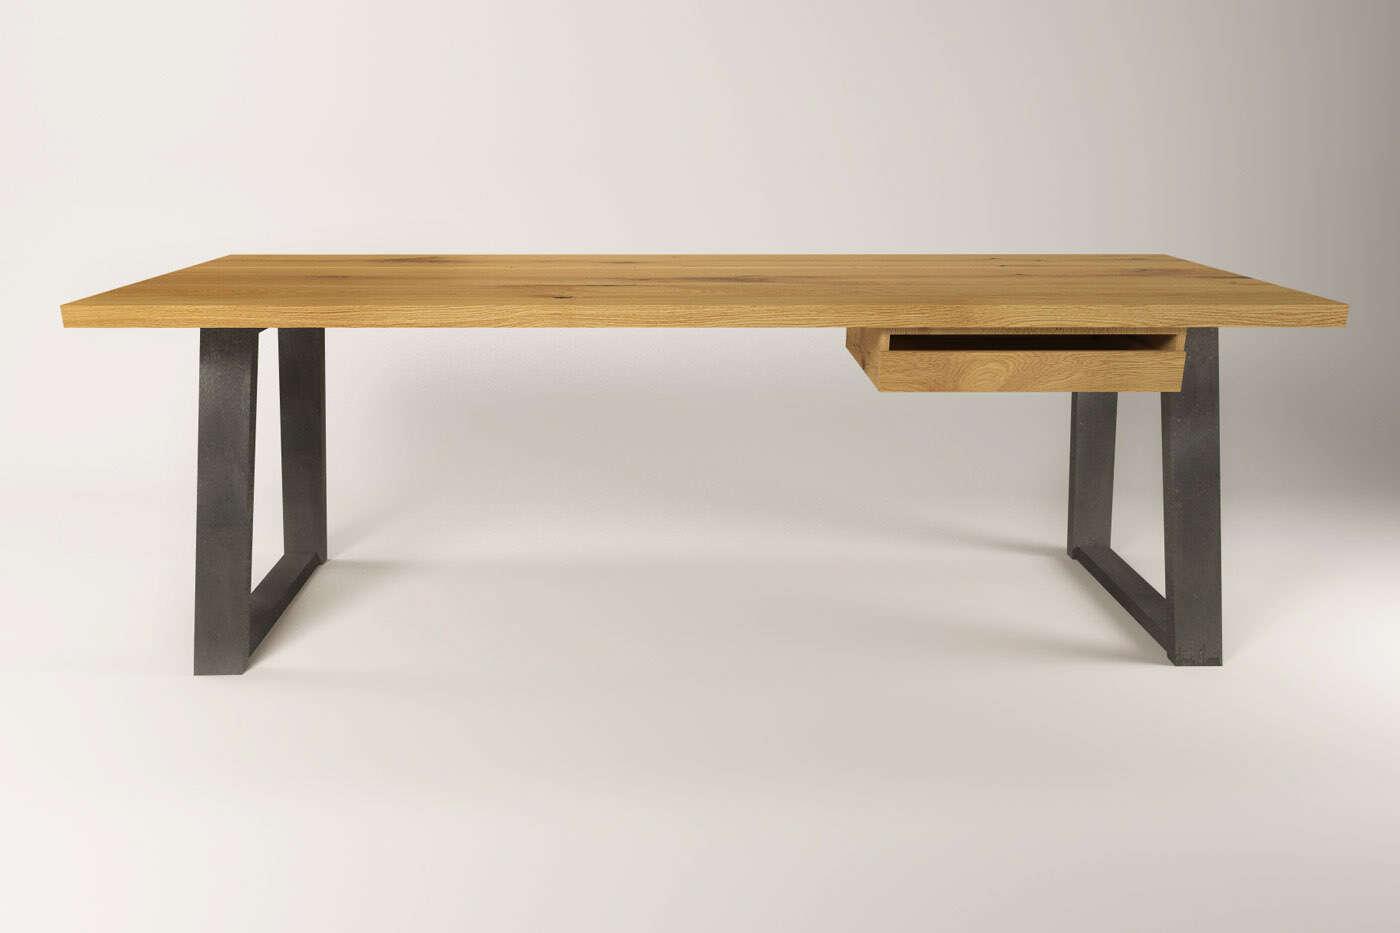 moderner schreibtisch massivholz eiche larvik. Black Bedroom Furniture Sets. Home Design Ideas